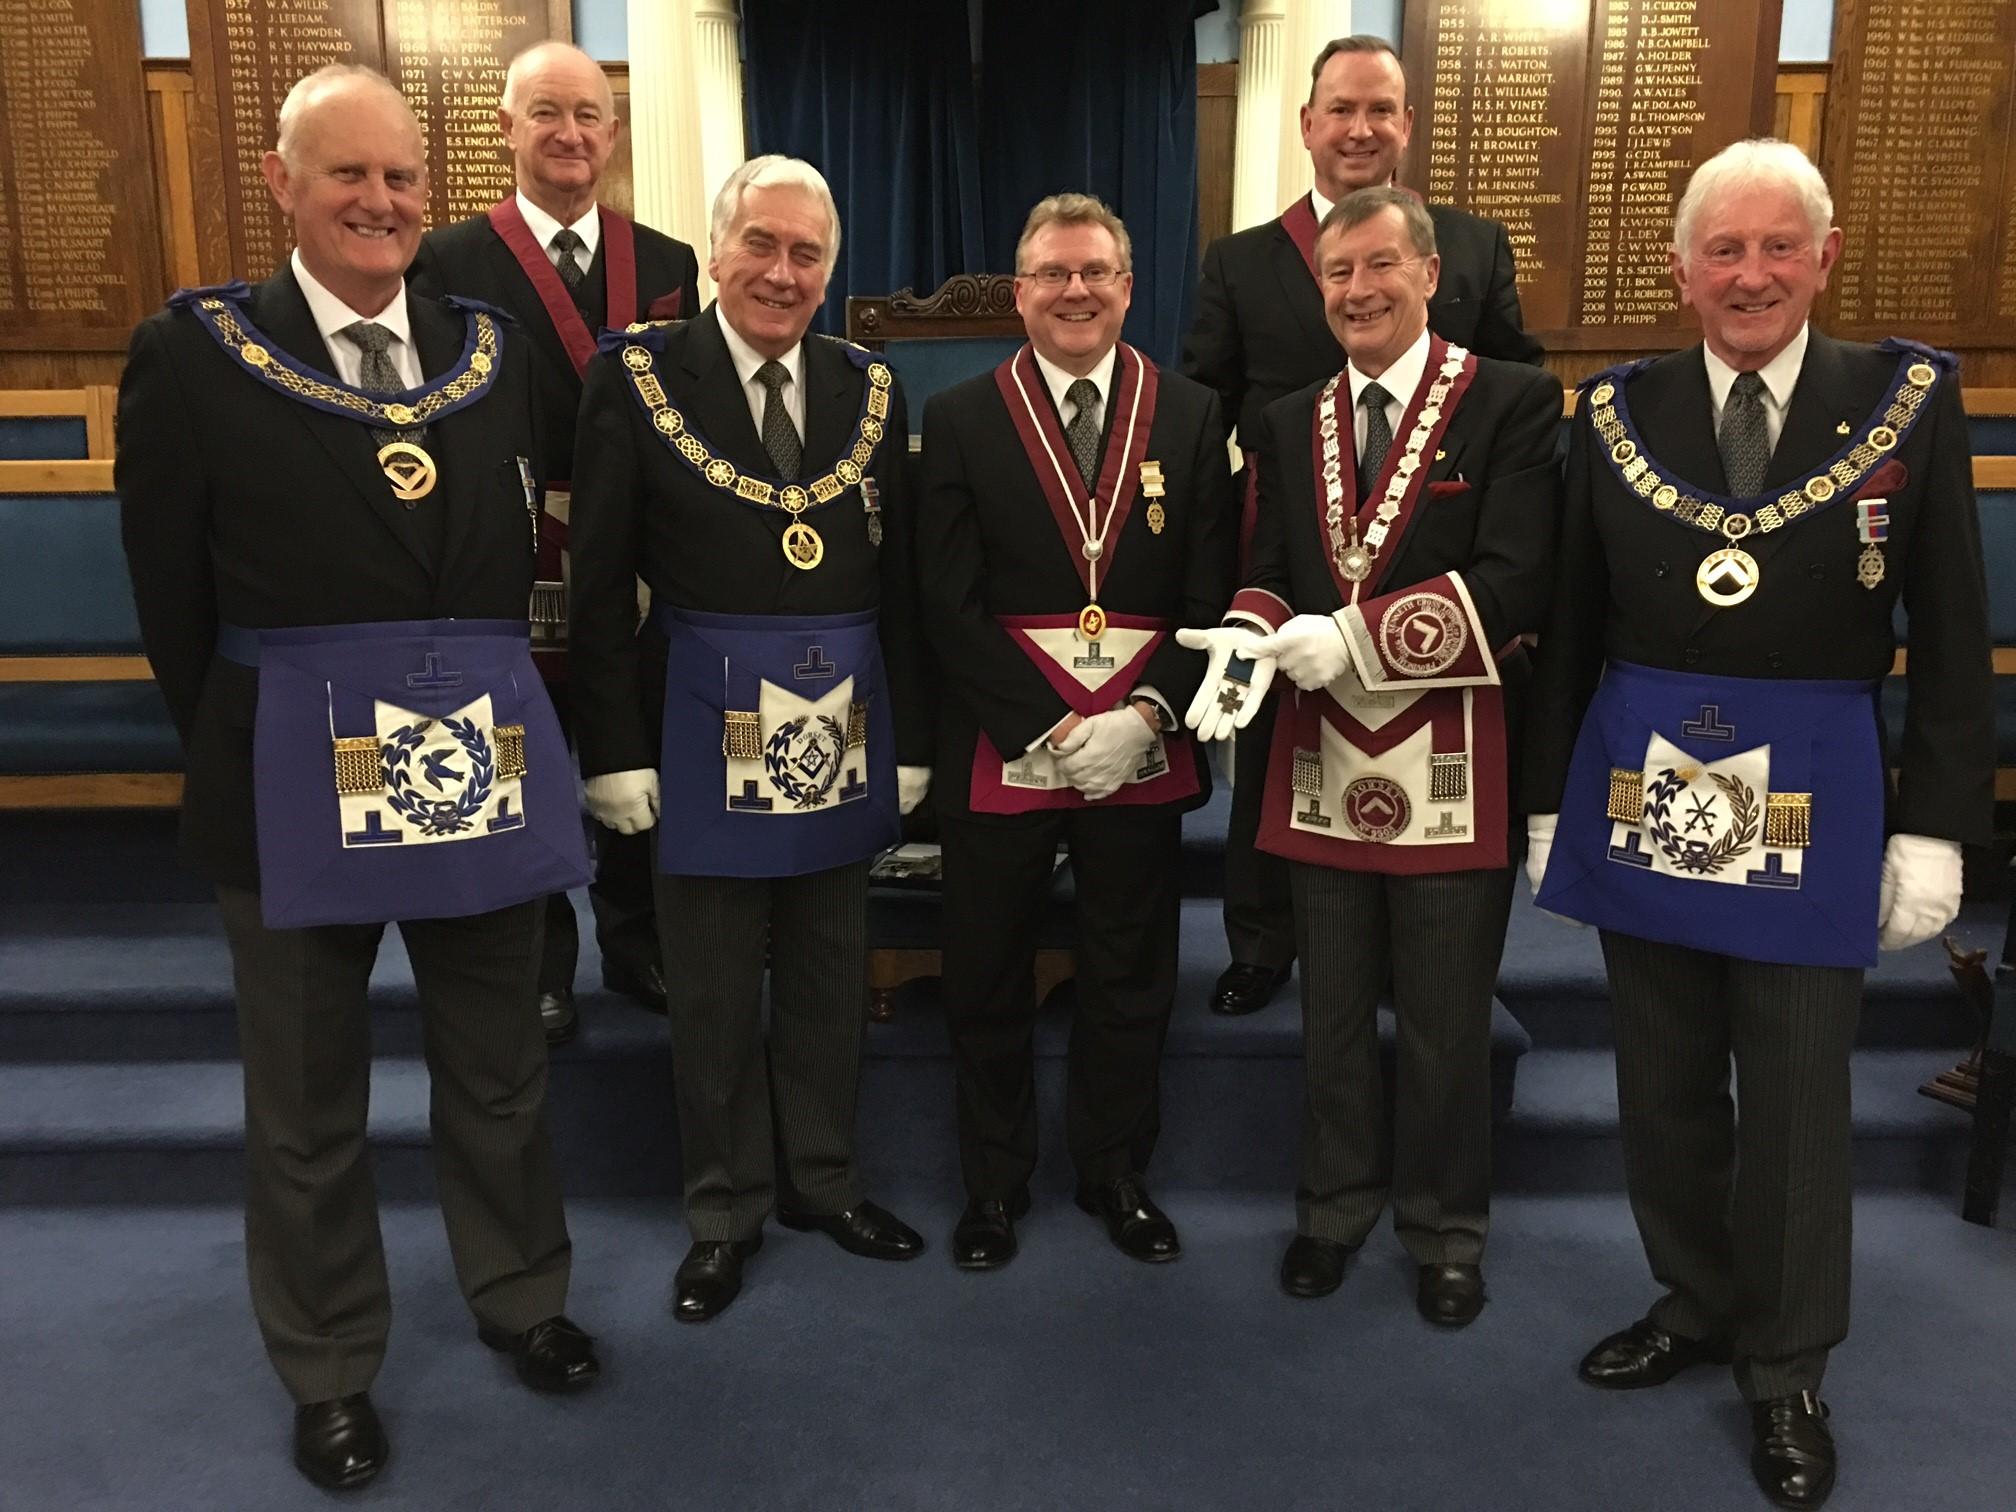 Freemasonry celebrates 300 years in Dorset (but it's not all secret